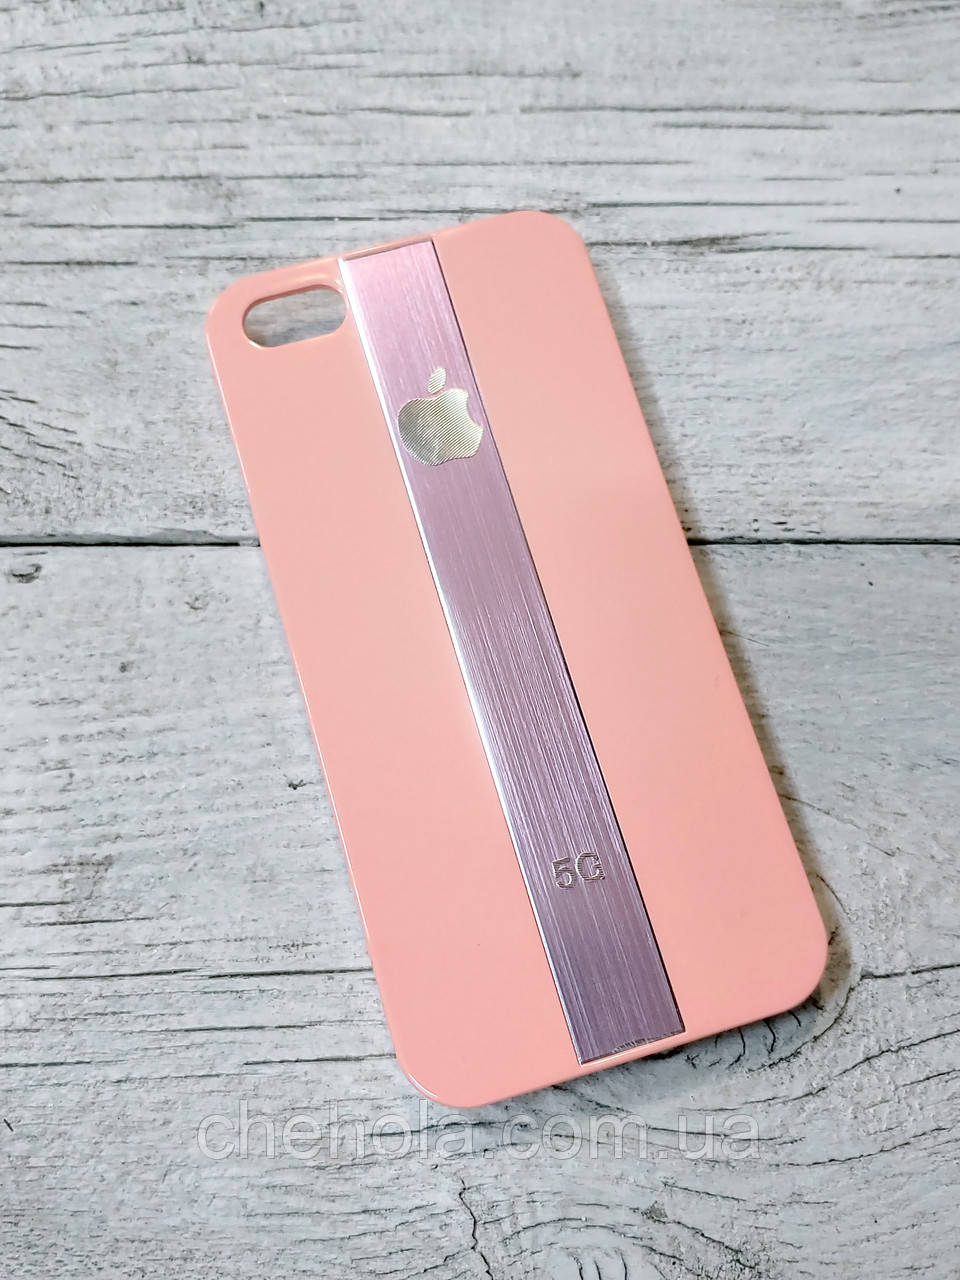 Протиударний Чохол для Iphone 5 5S SE Juicy Metal Рожевий